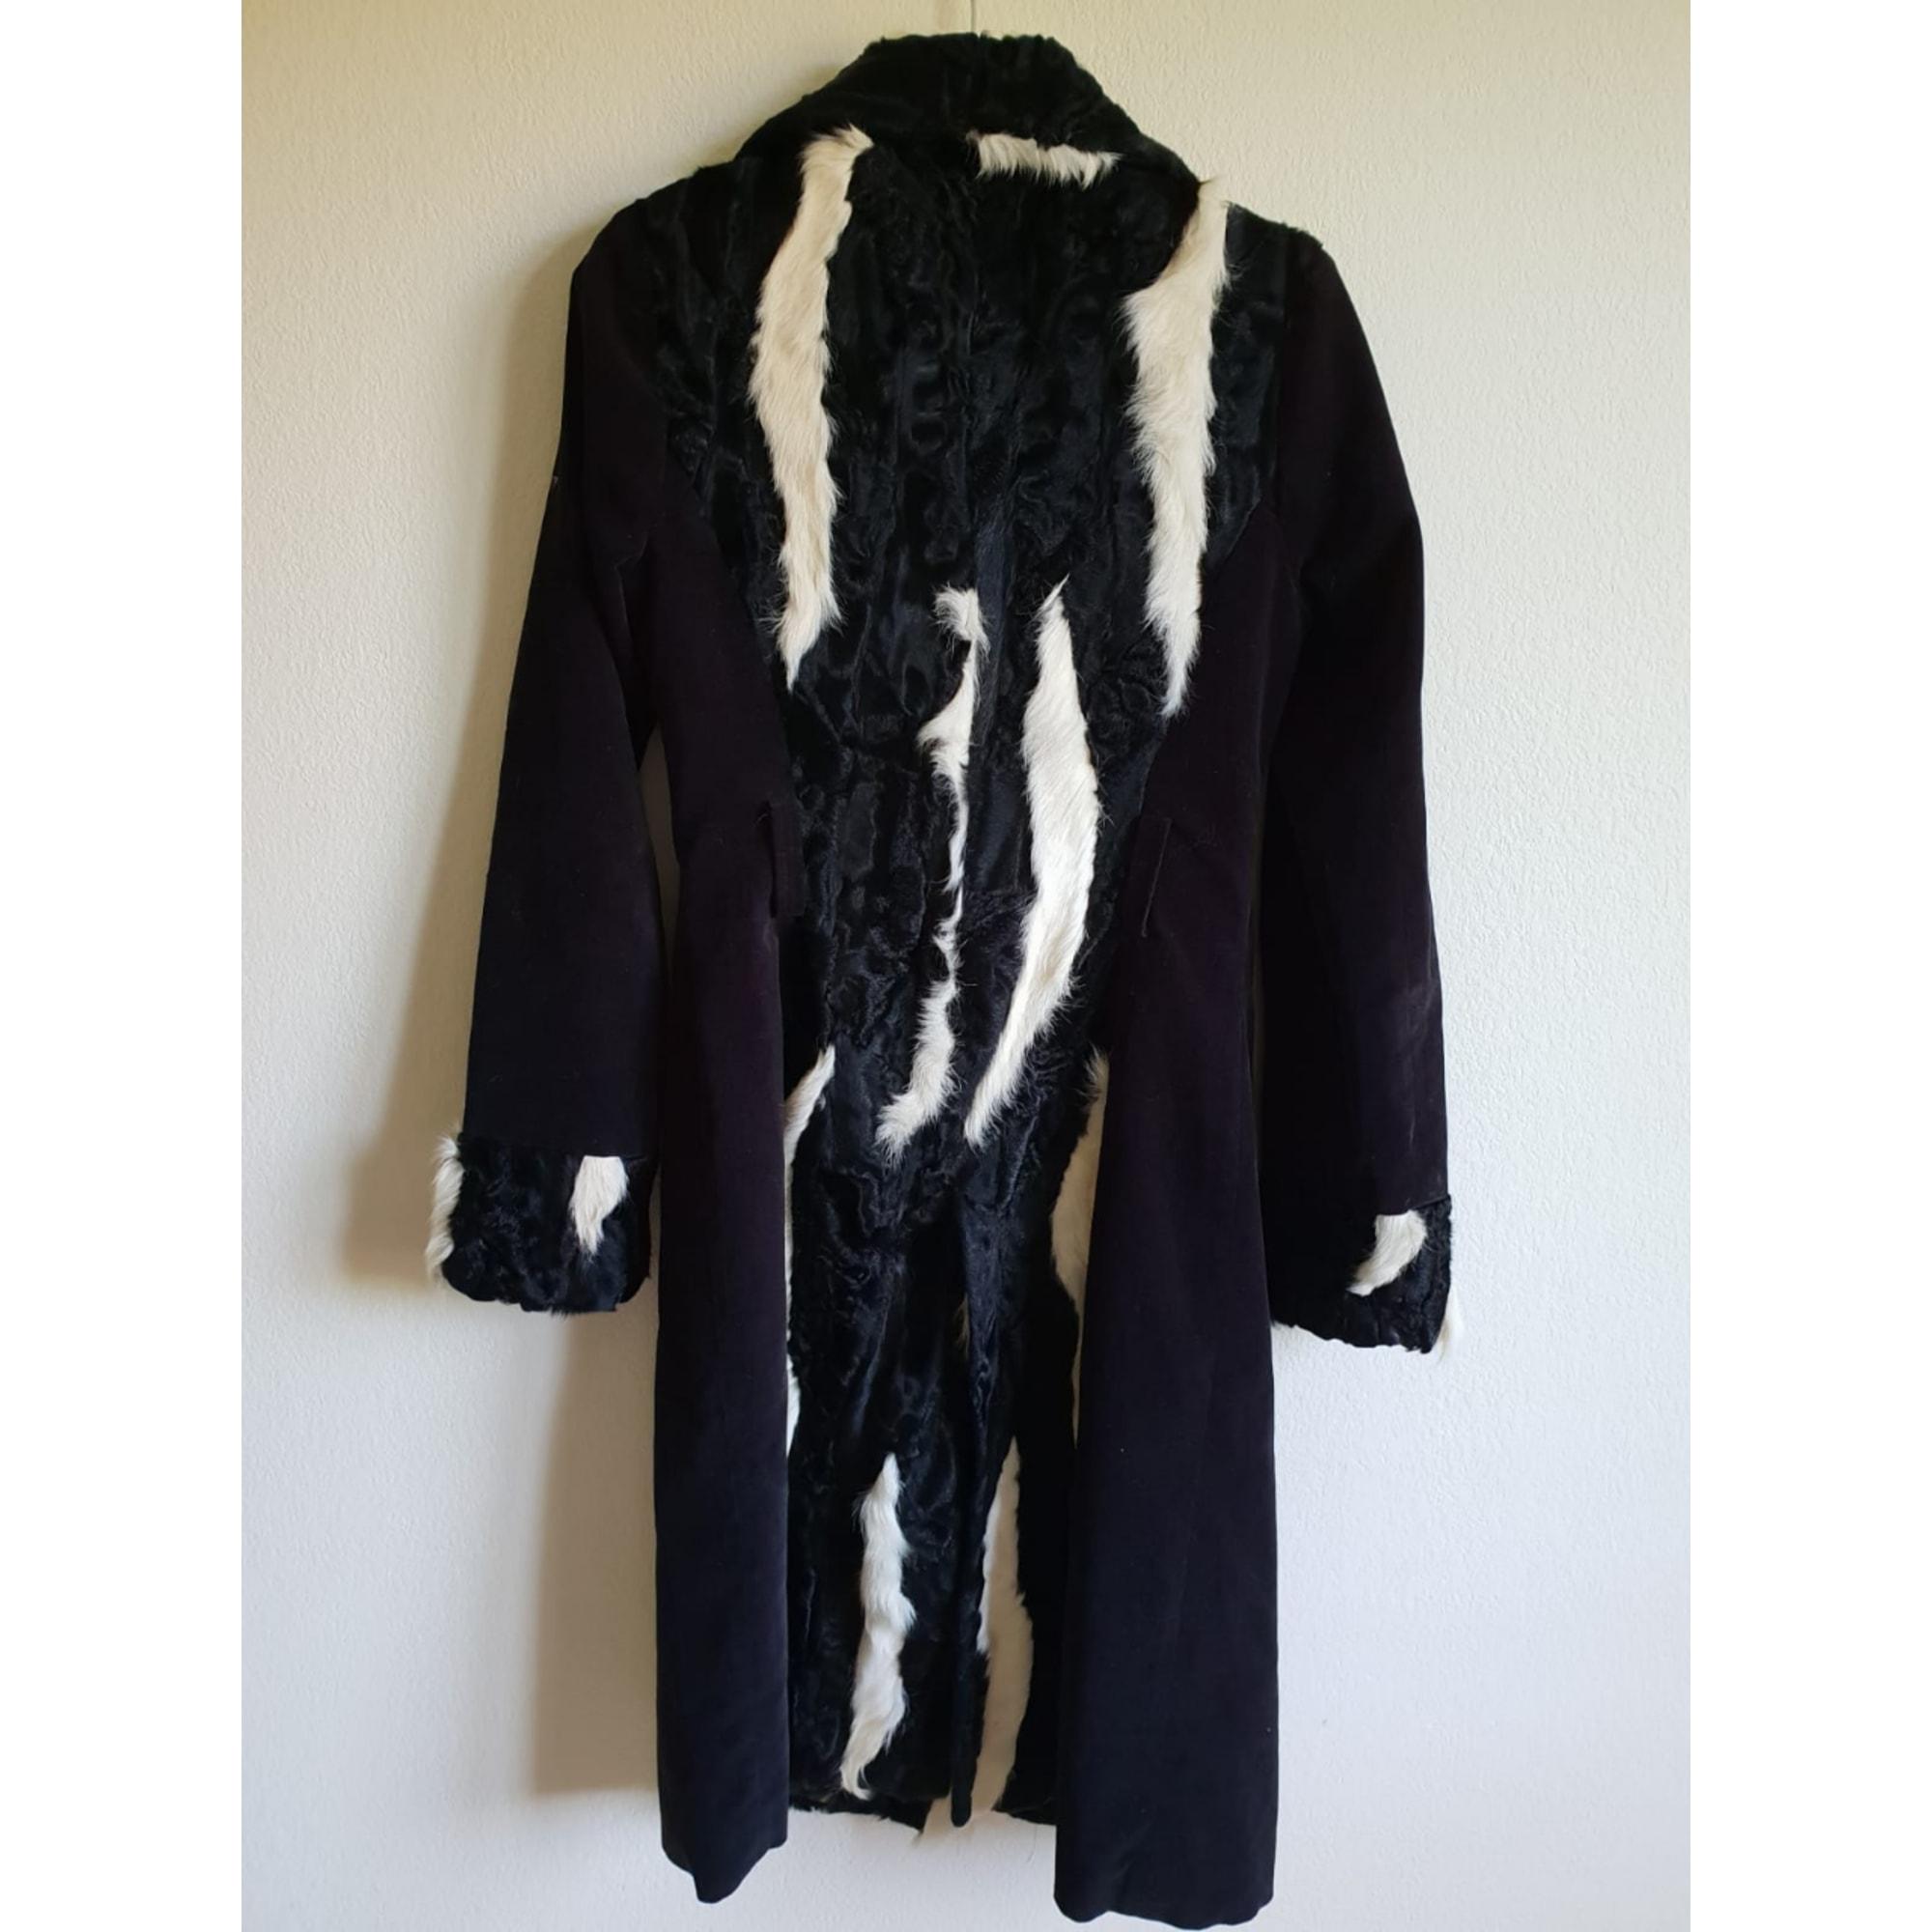 Manteau en fourrure DOLCE & GABBANA Imprimés animaliers